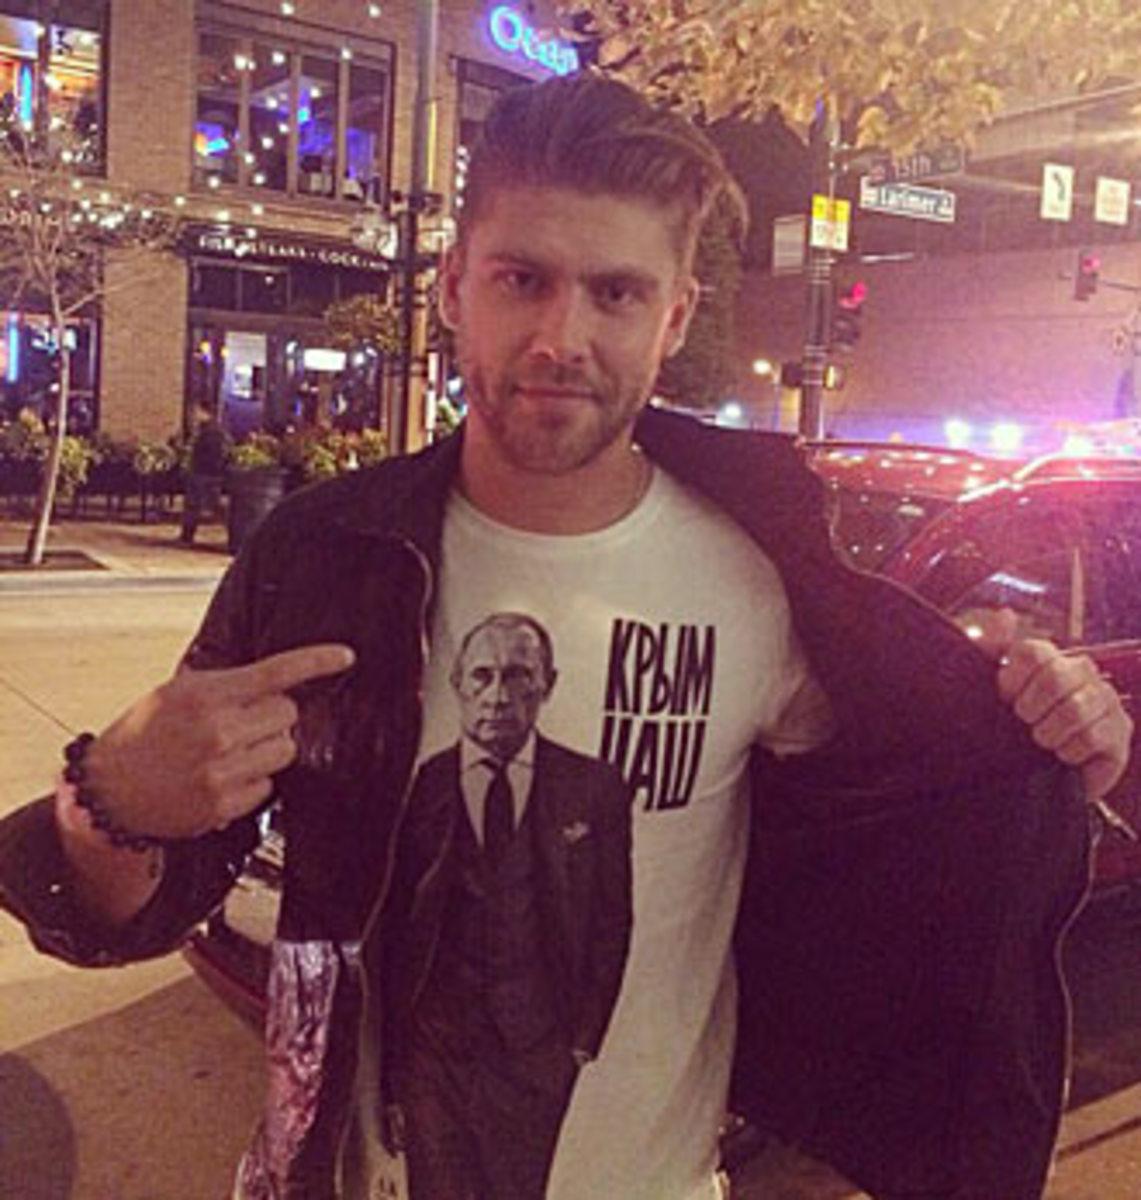 Semyon-Varlamov-Putin-shirt.jpg